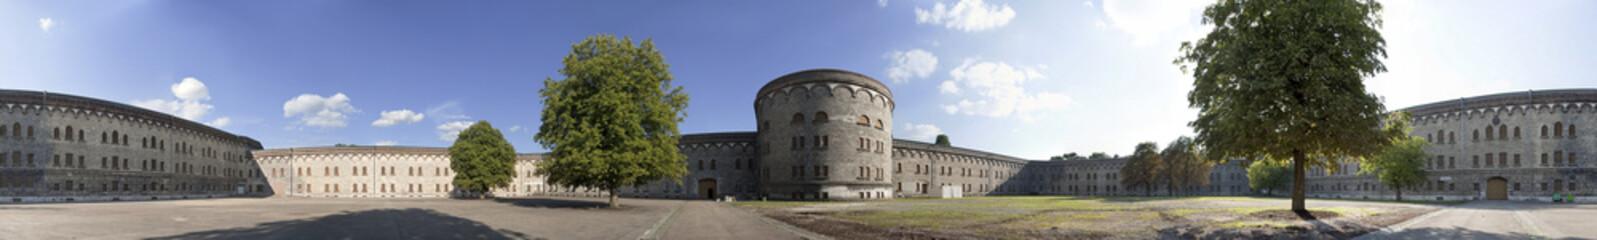 Festung auf dem Michelsberg ULM